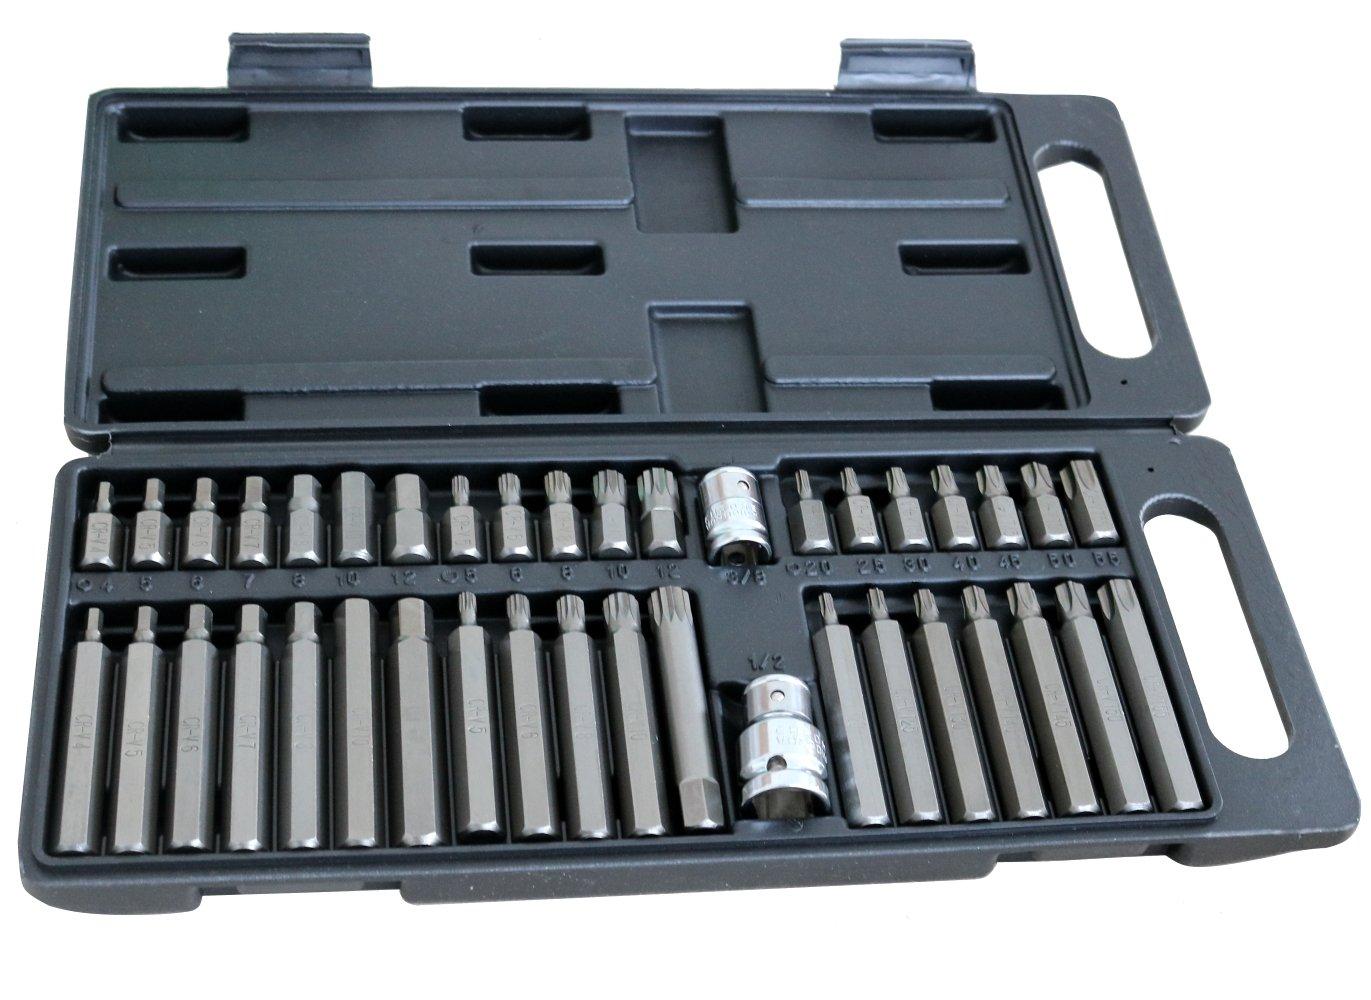 AERZETIX: Caja con 39 puntas de destornillador Torx Allen ...